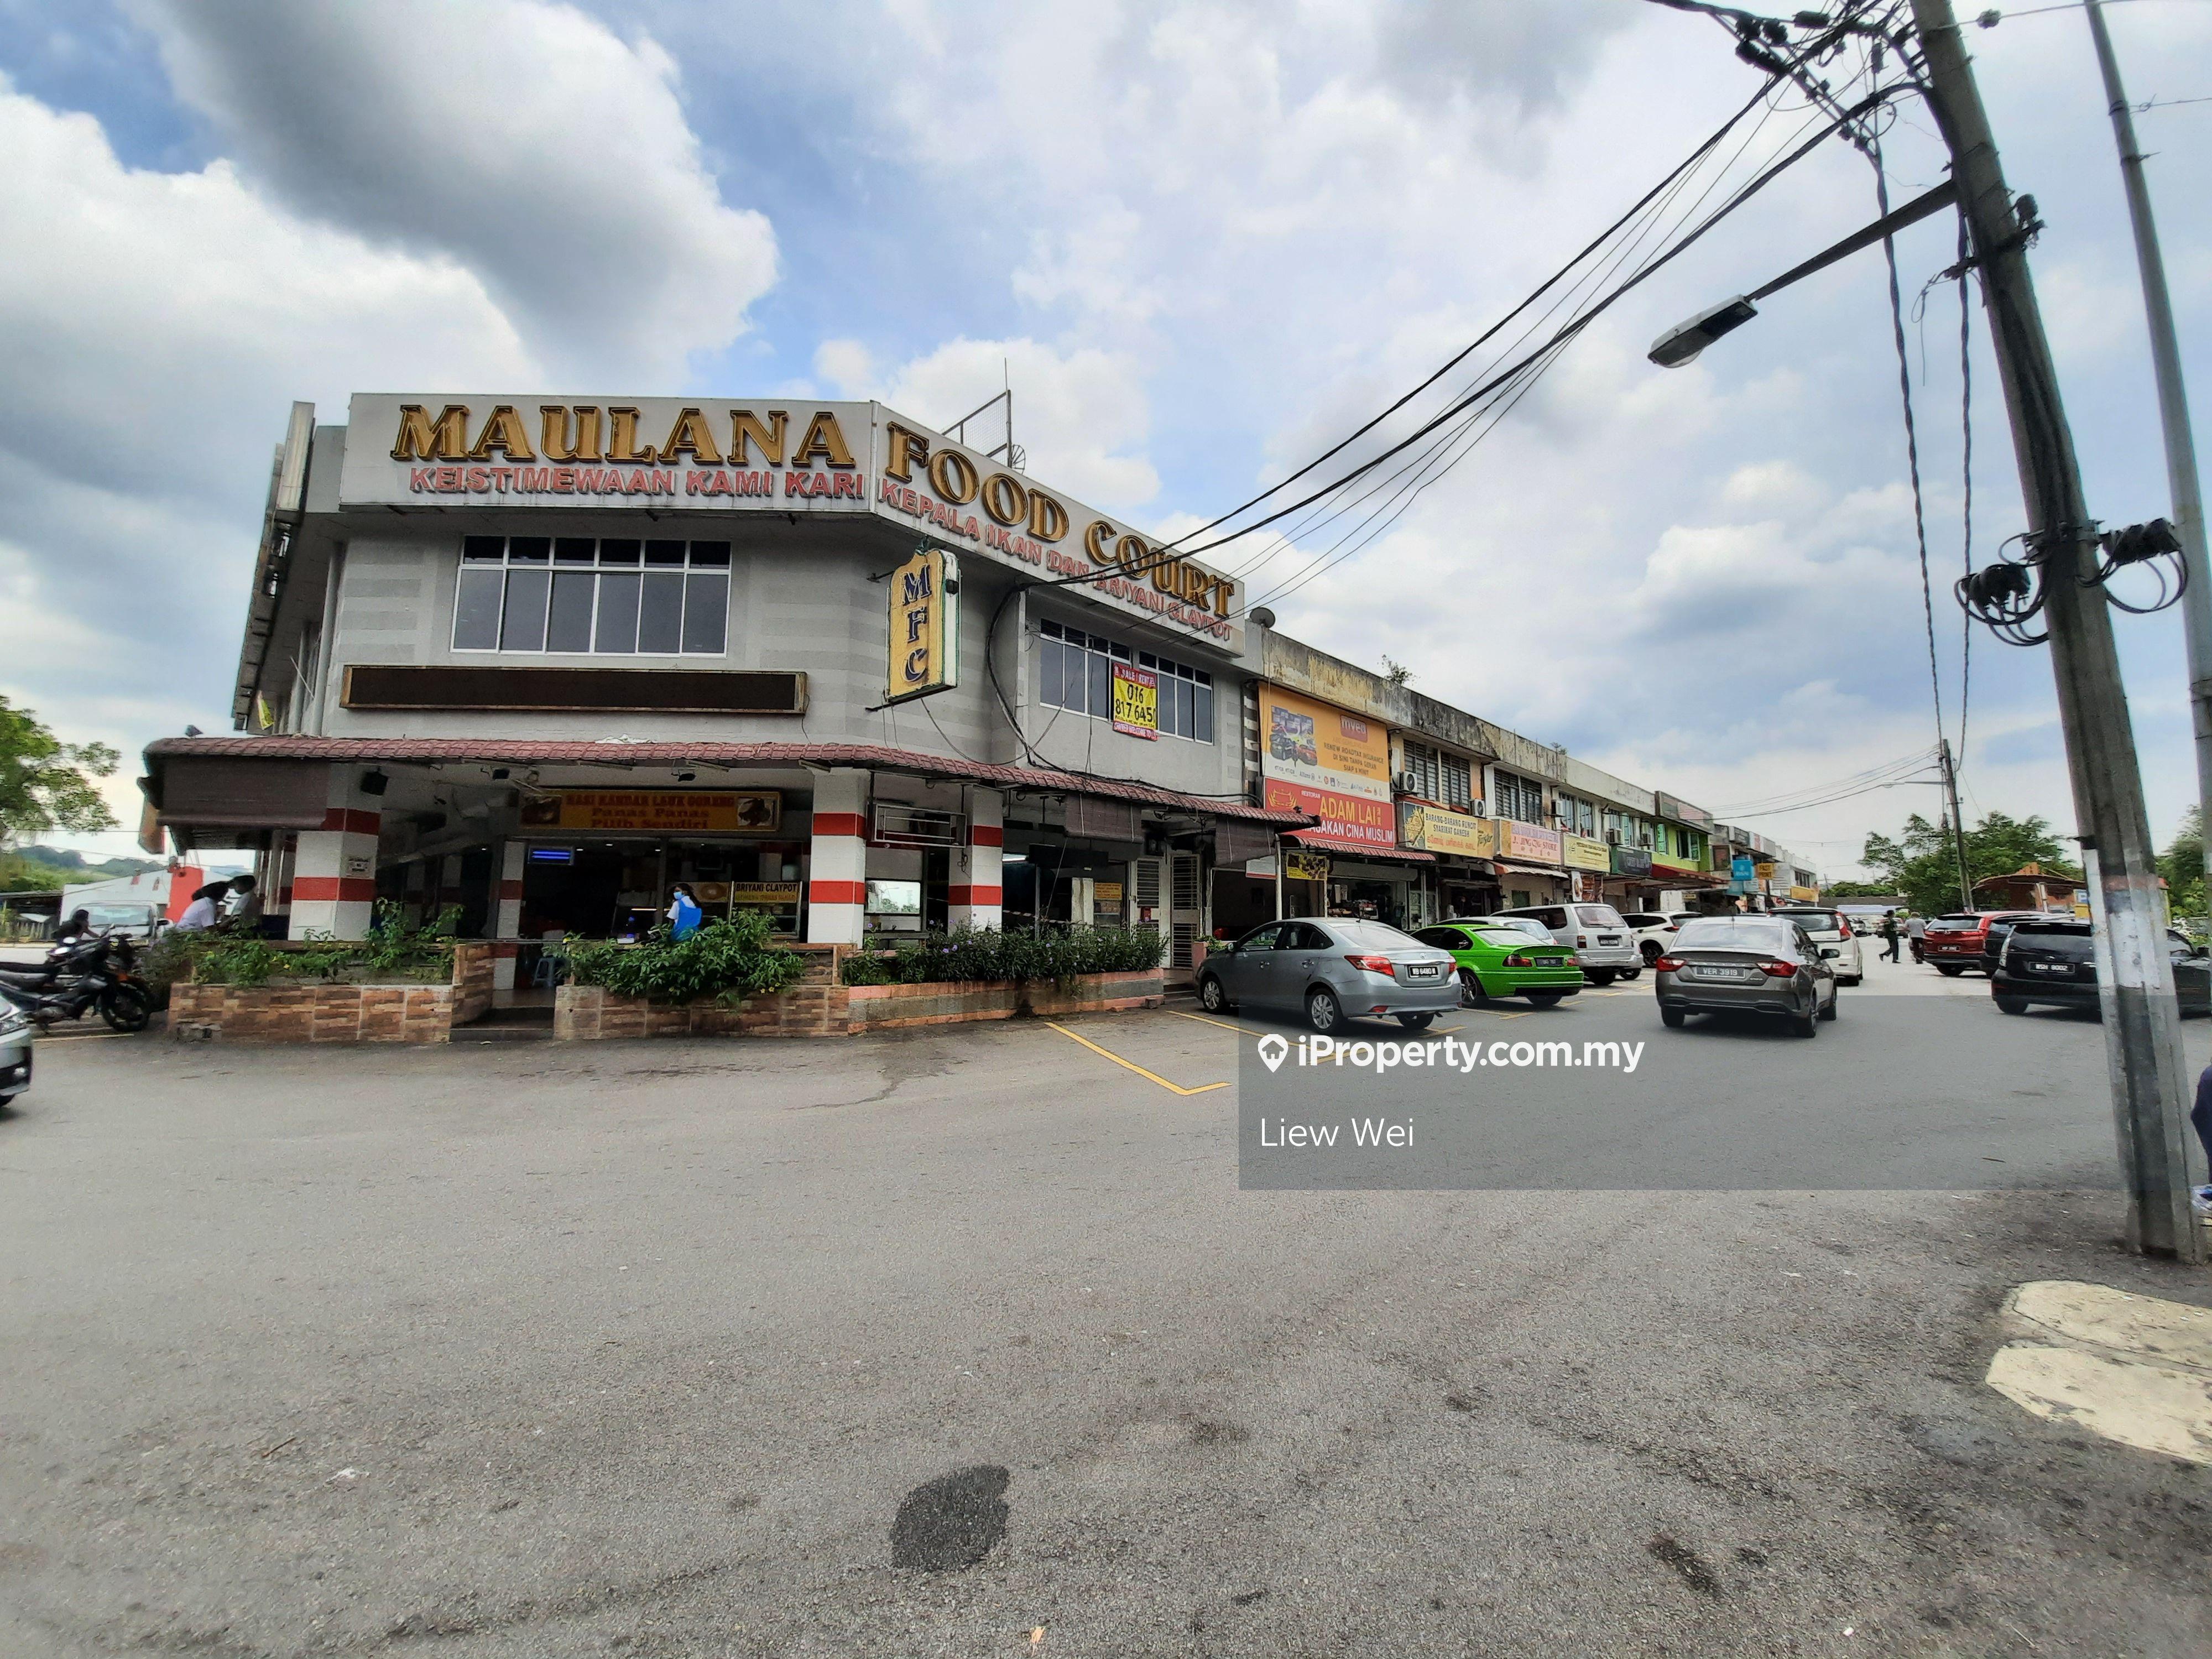 2 Storey Corner Shop lot, Taman Sri Serdang, Taman Sri Serdang, Serdang